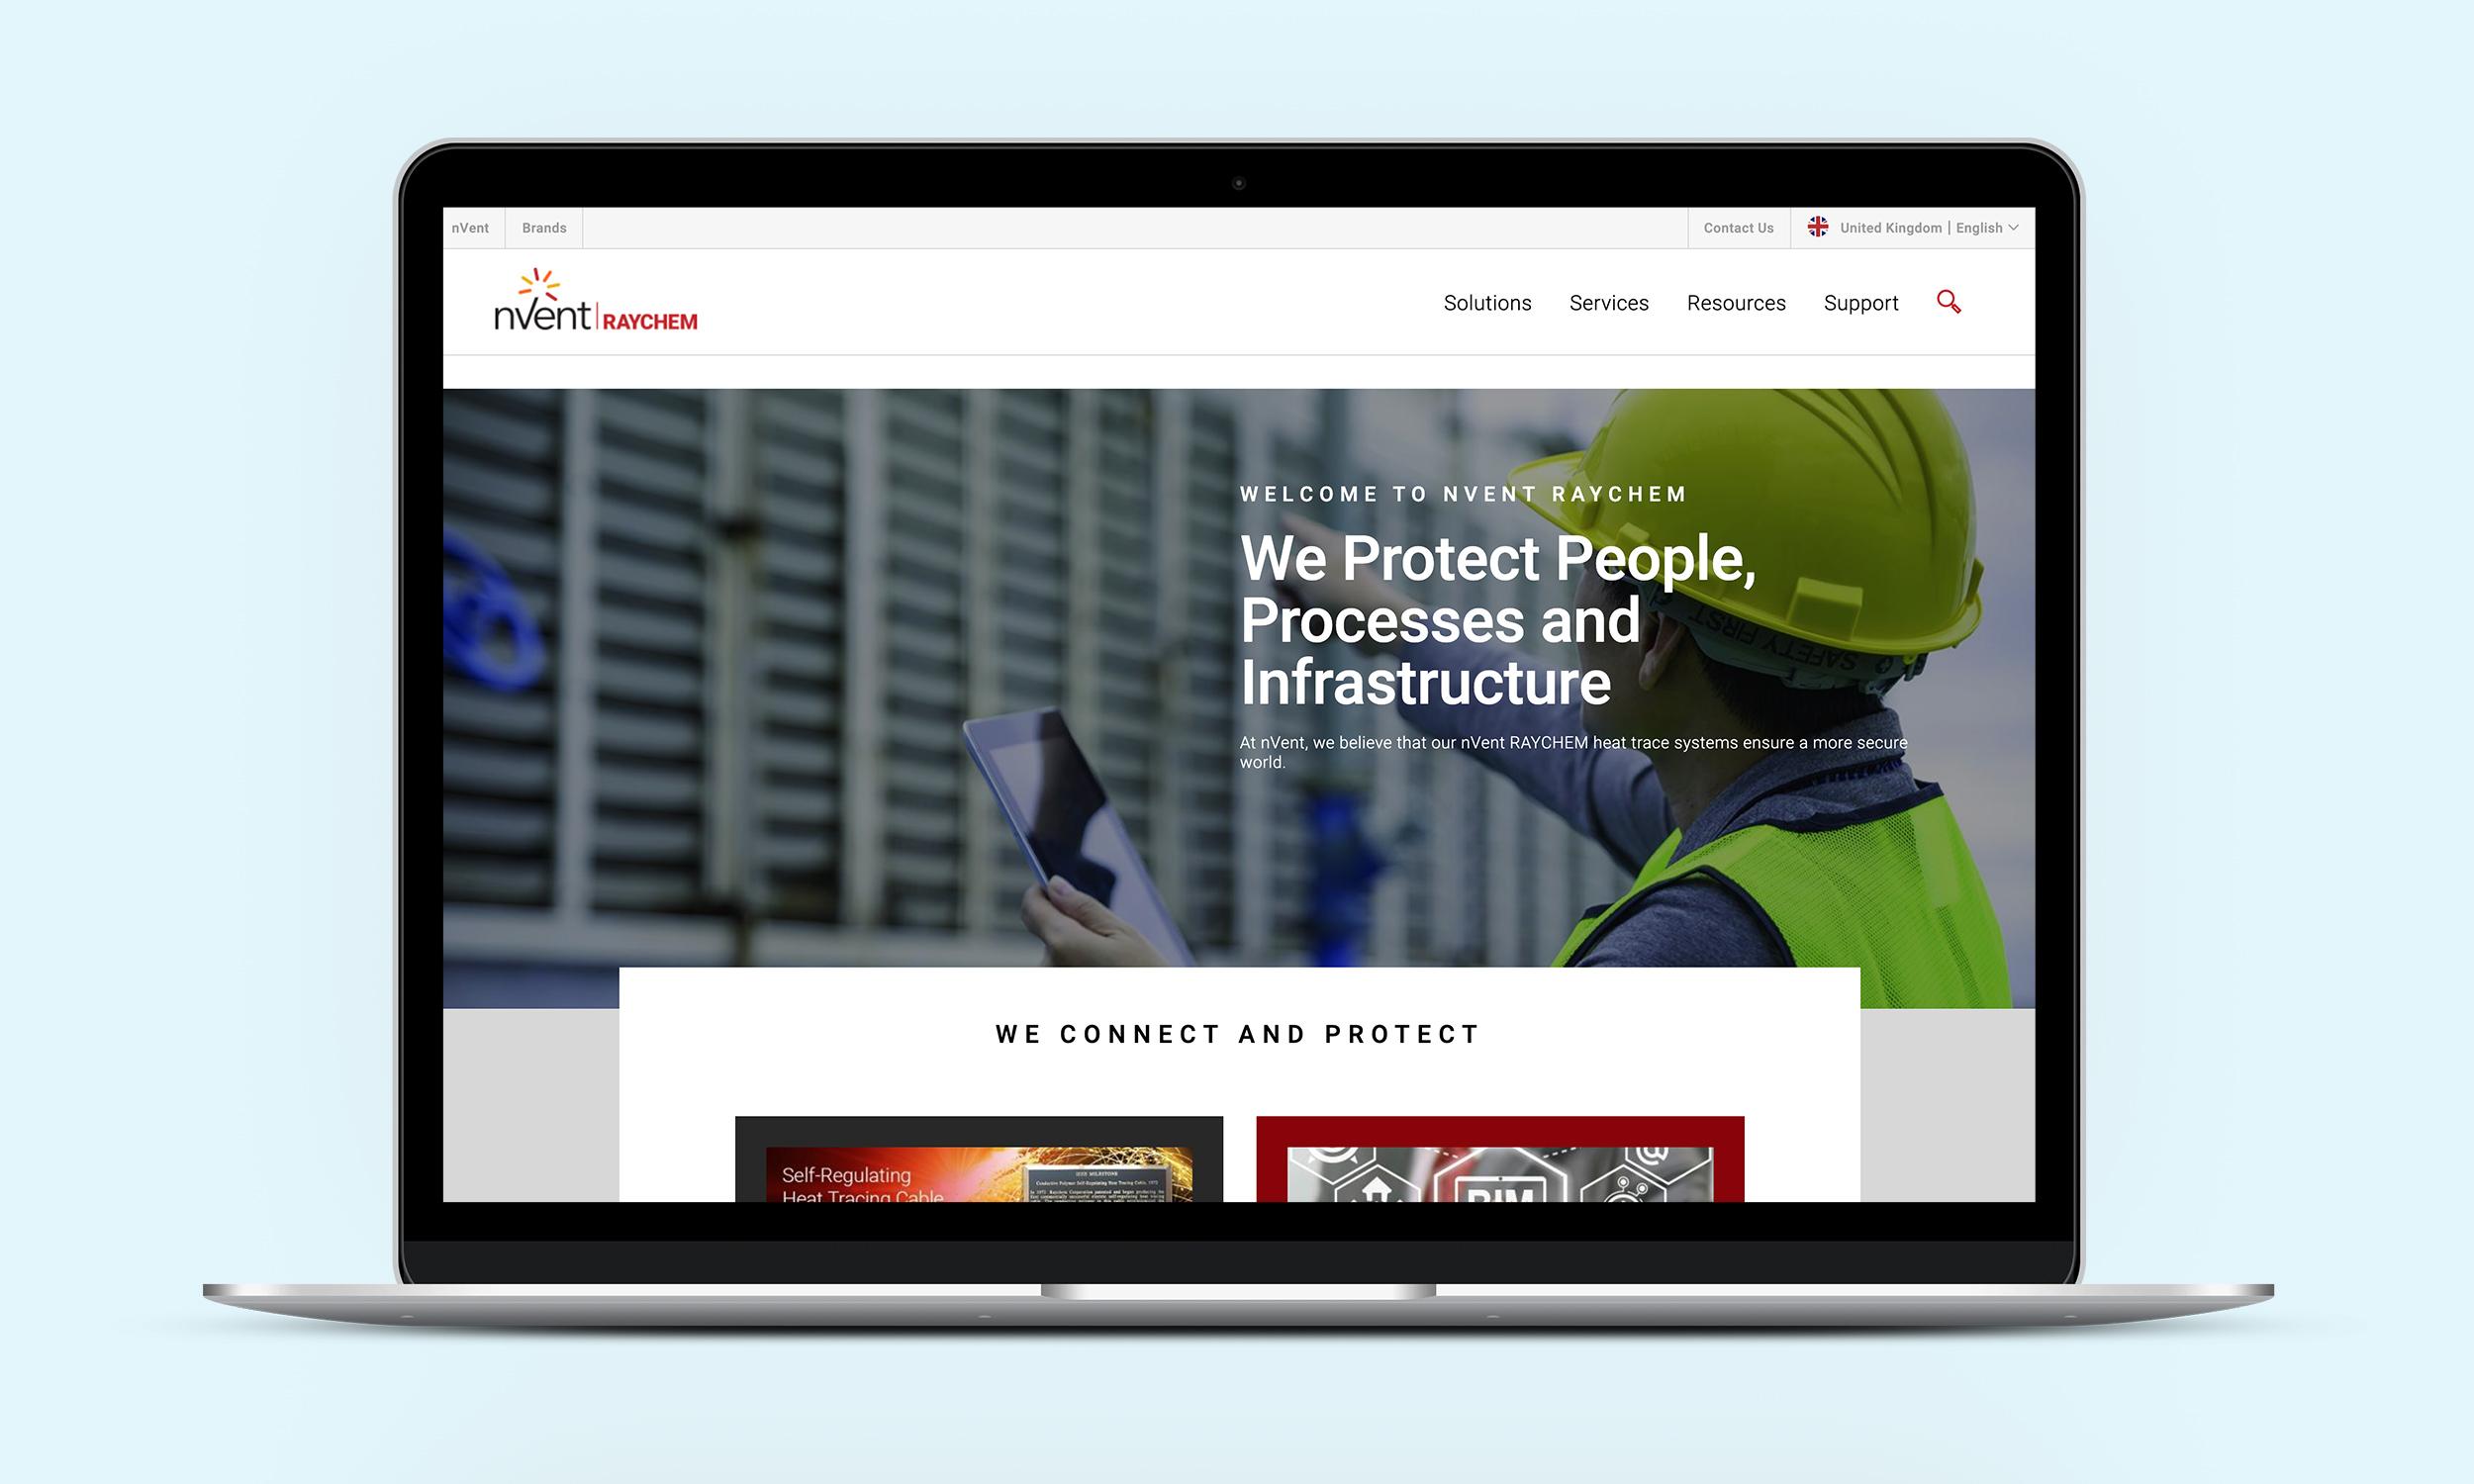 The nVent website also needed an asset overhaul